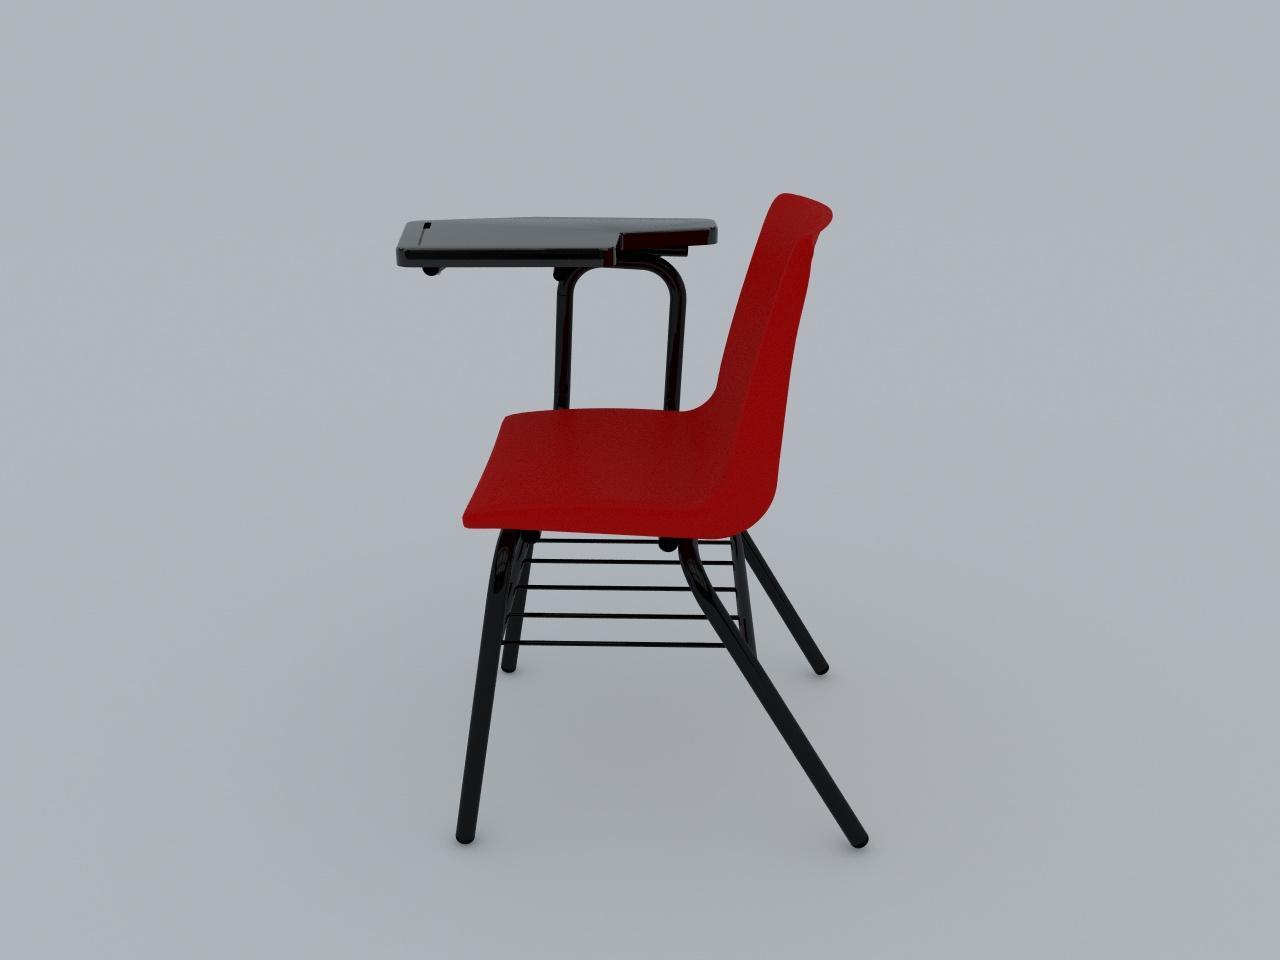 silla de paleta concha plastica color rojo paleta plastica negra